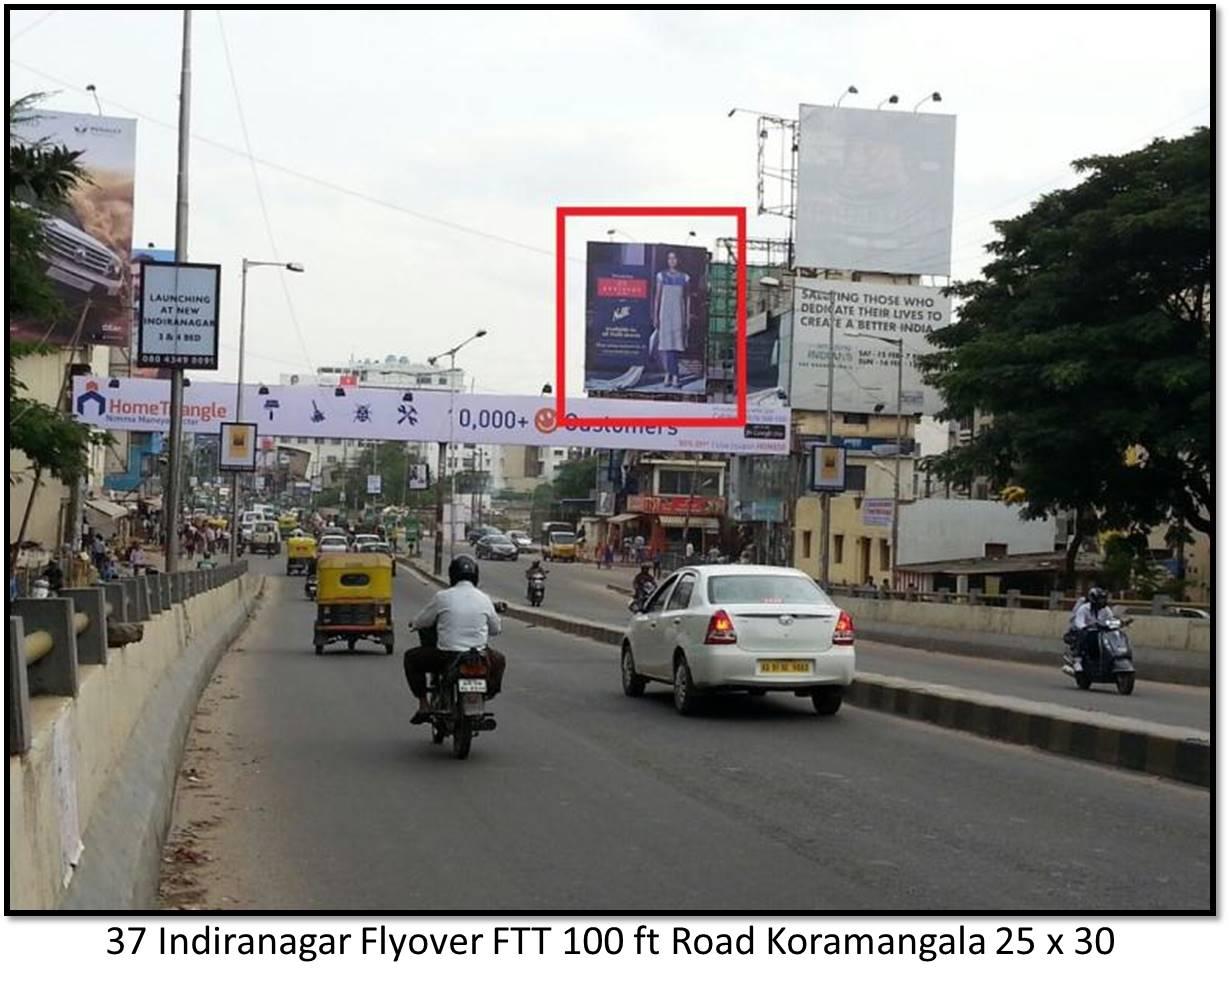 Indiranagar Flyover, Bengaluru